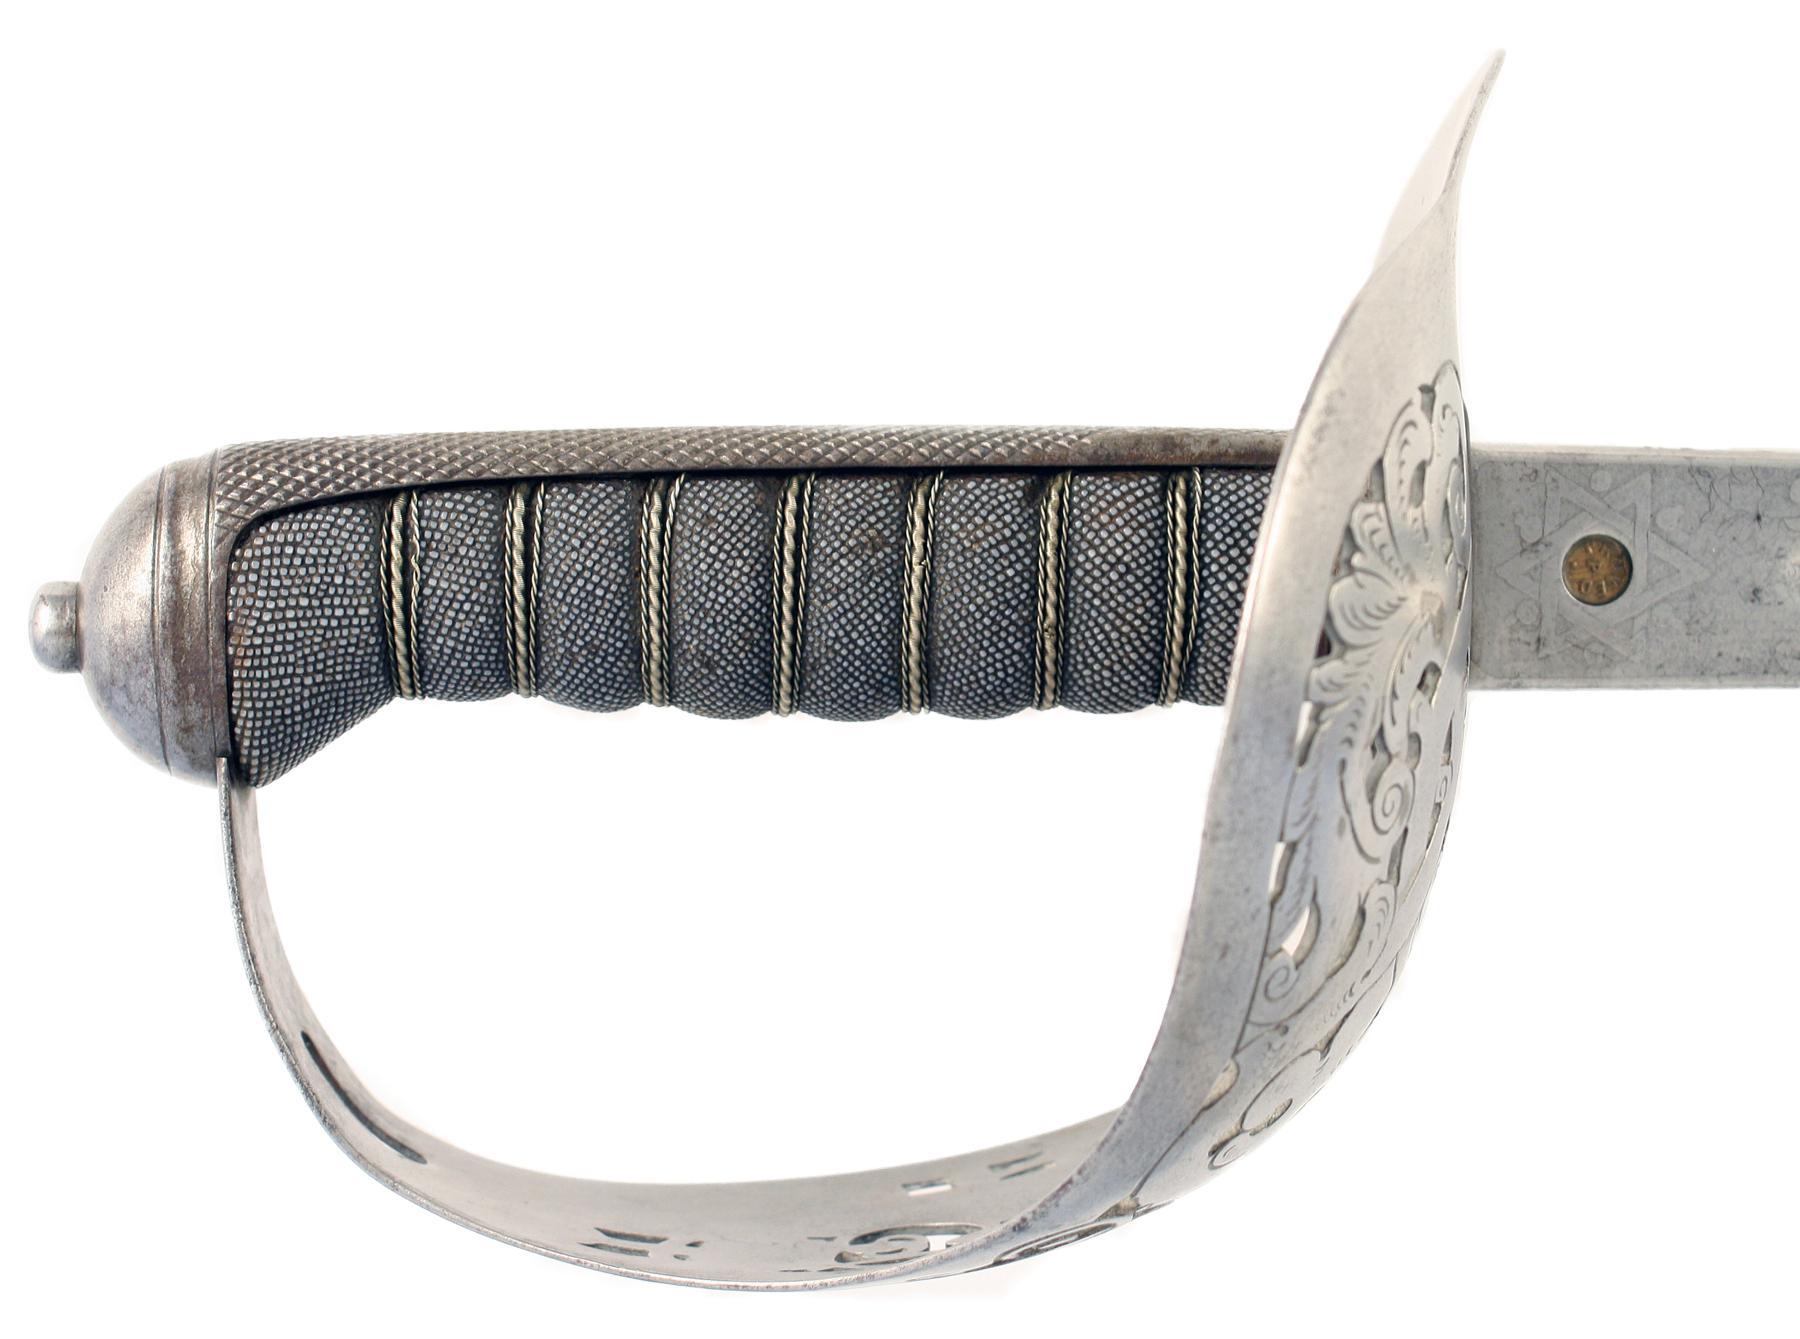 An 1897 Pattern Sword